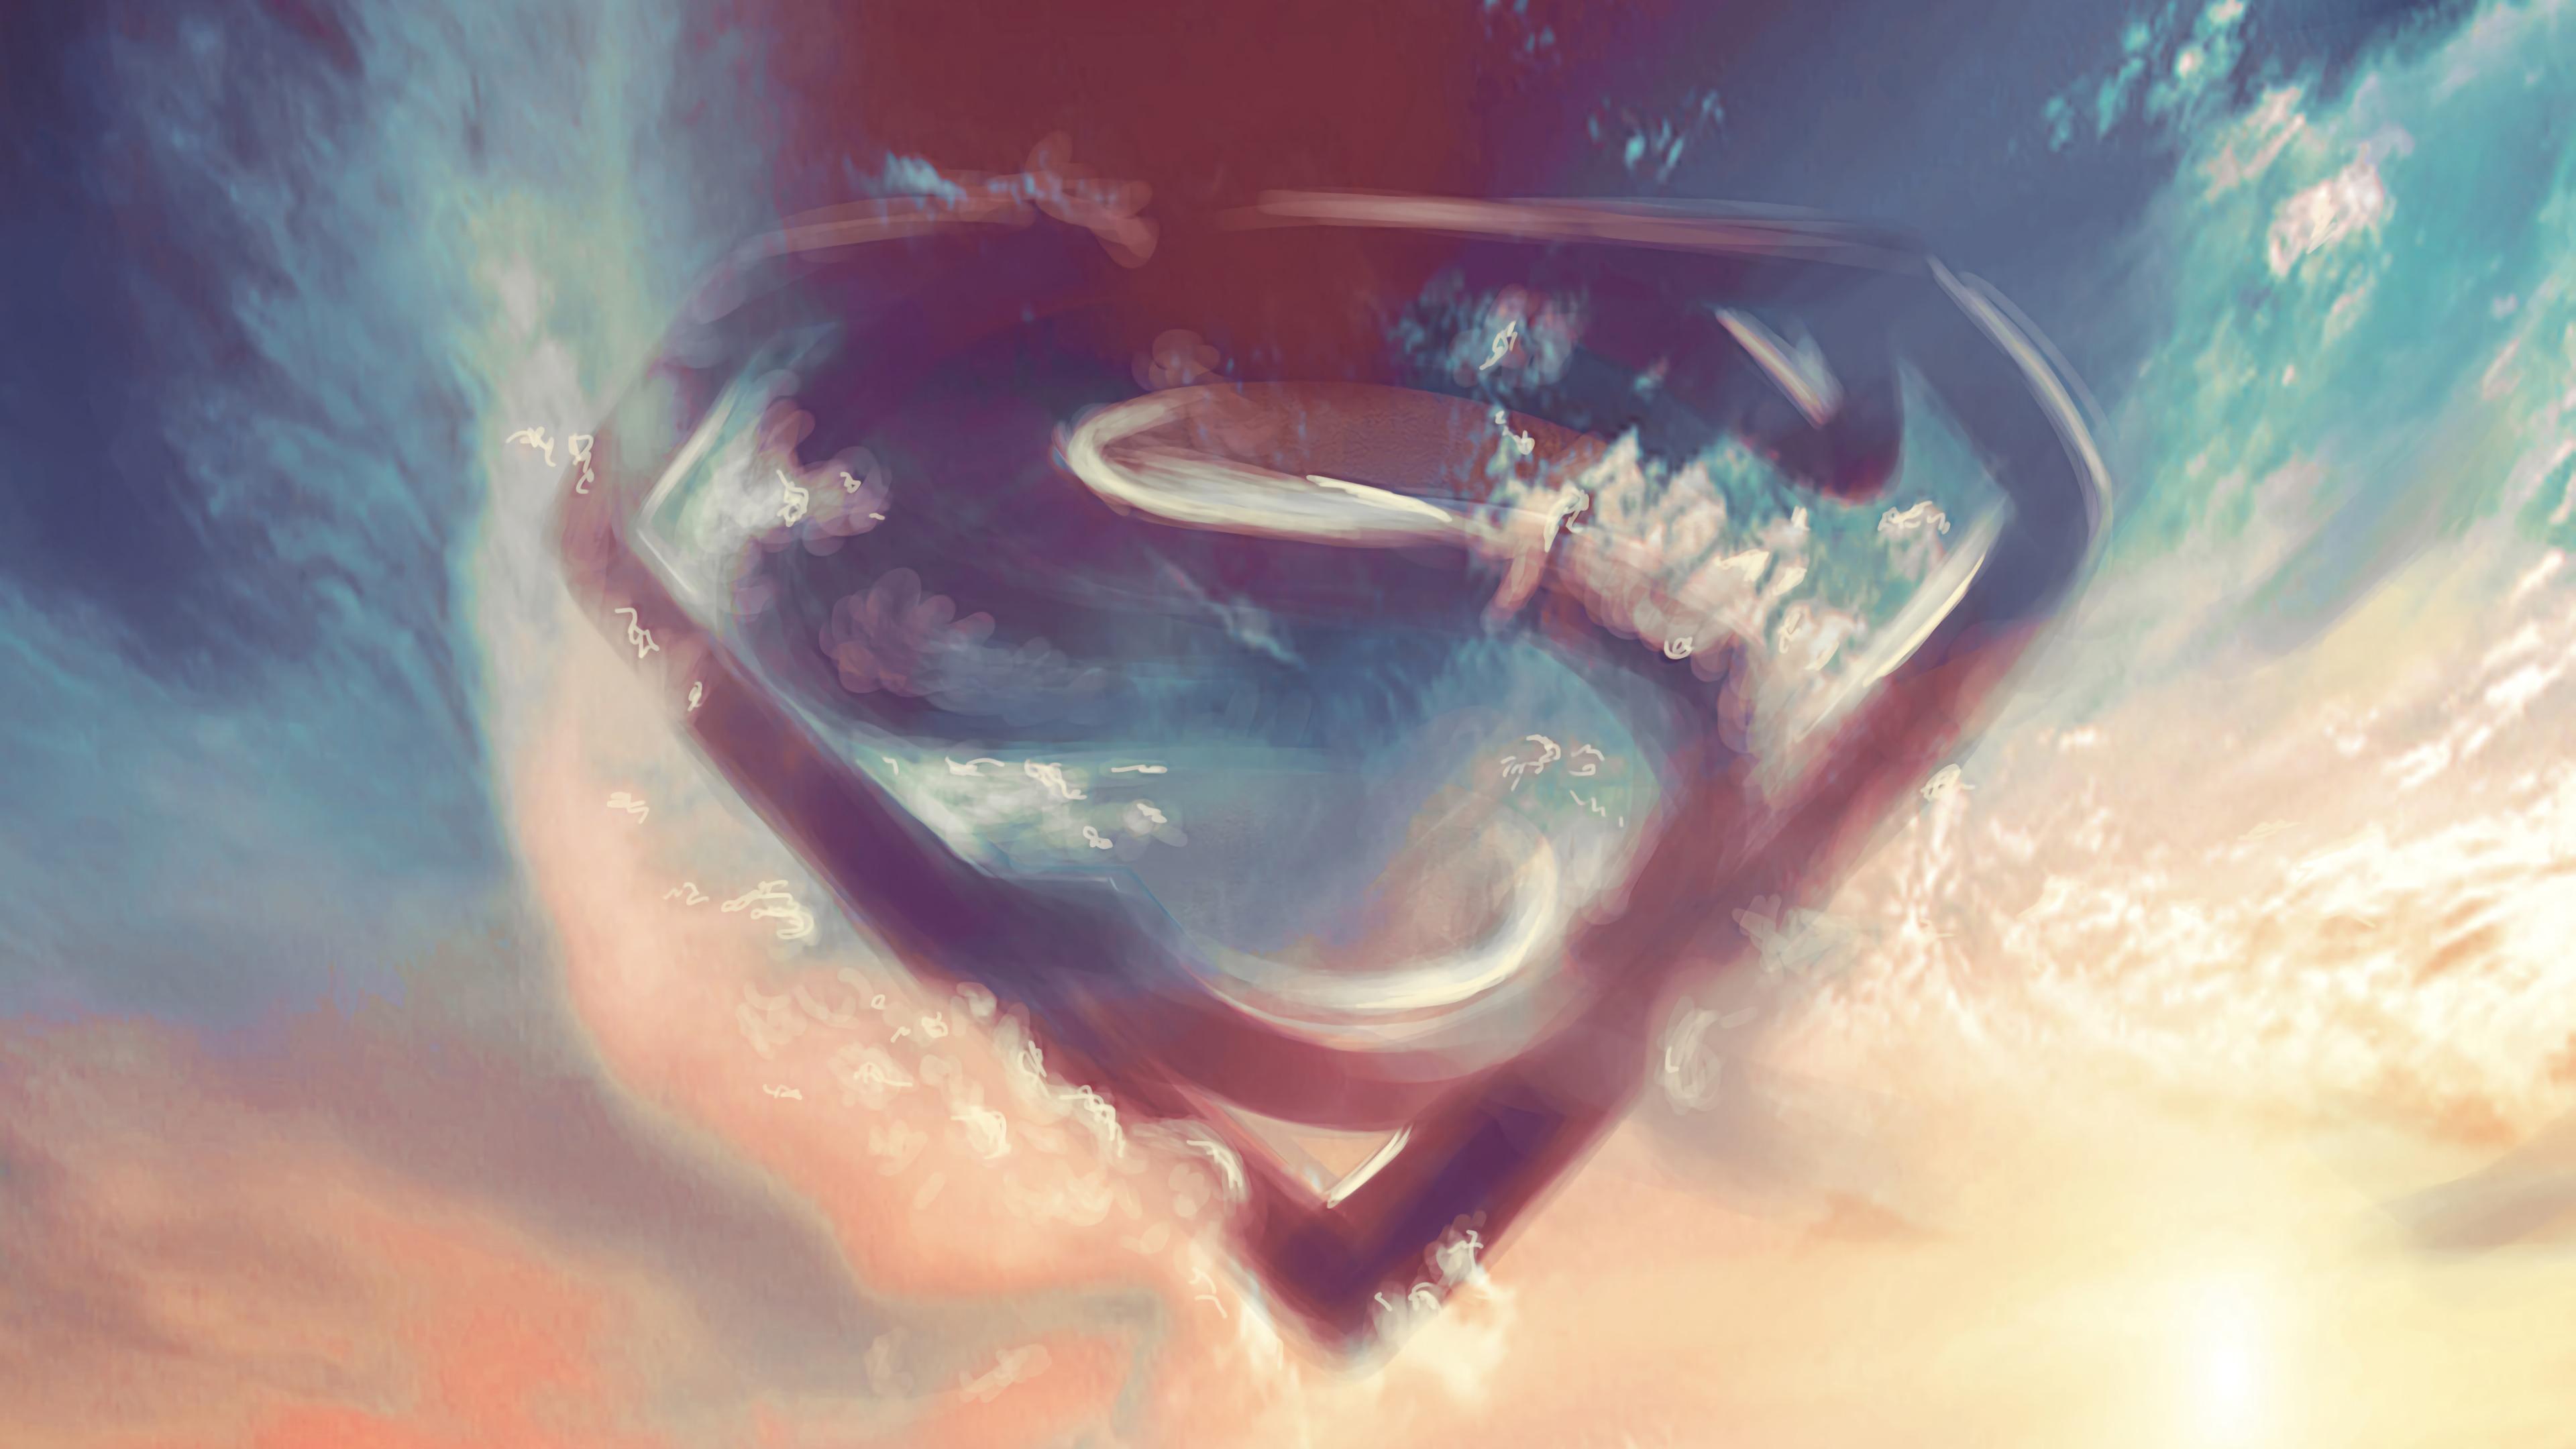 superman logo in clouds 1568055135 - Superman Logo In Clouds - superman wallpapers, superheroes wallpapers, logo wallpapers, hd-wallpapers, digital art wallpapers, artwork wallpapers, artstation wallpapers, 4k-wallpapers